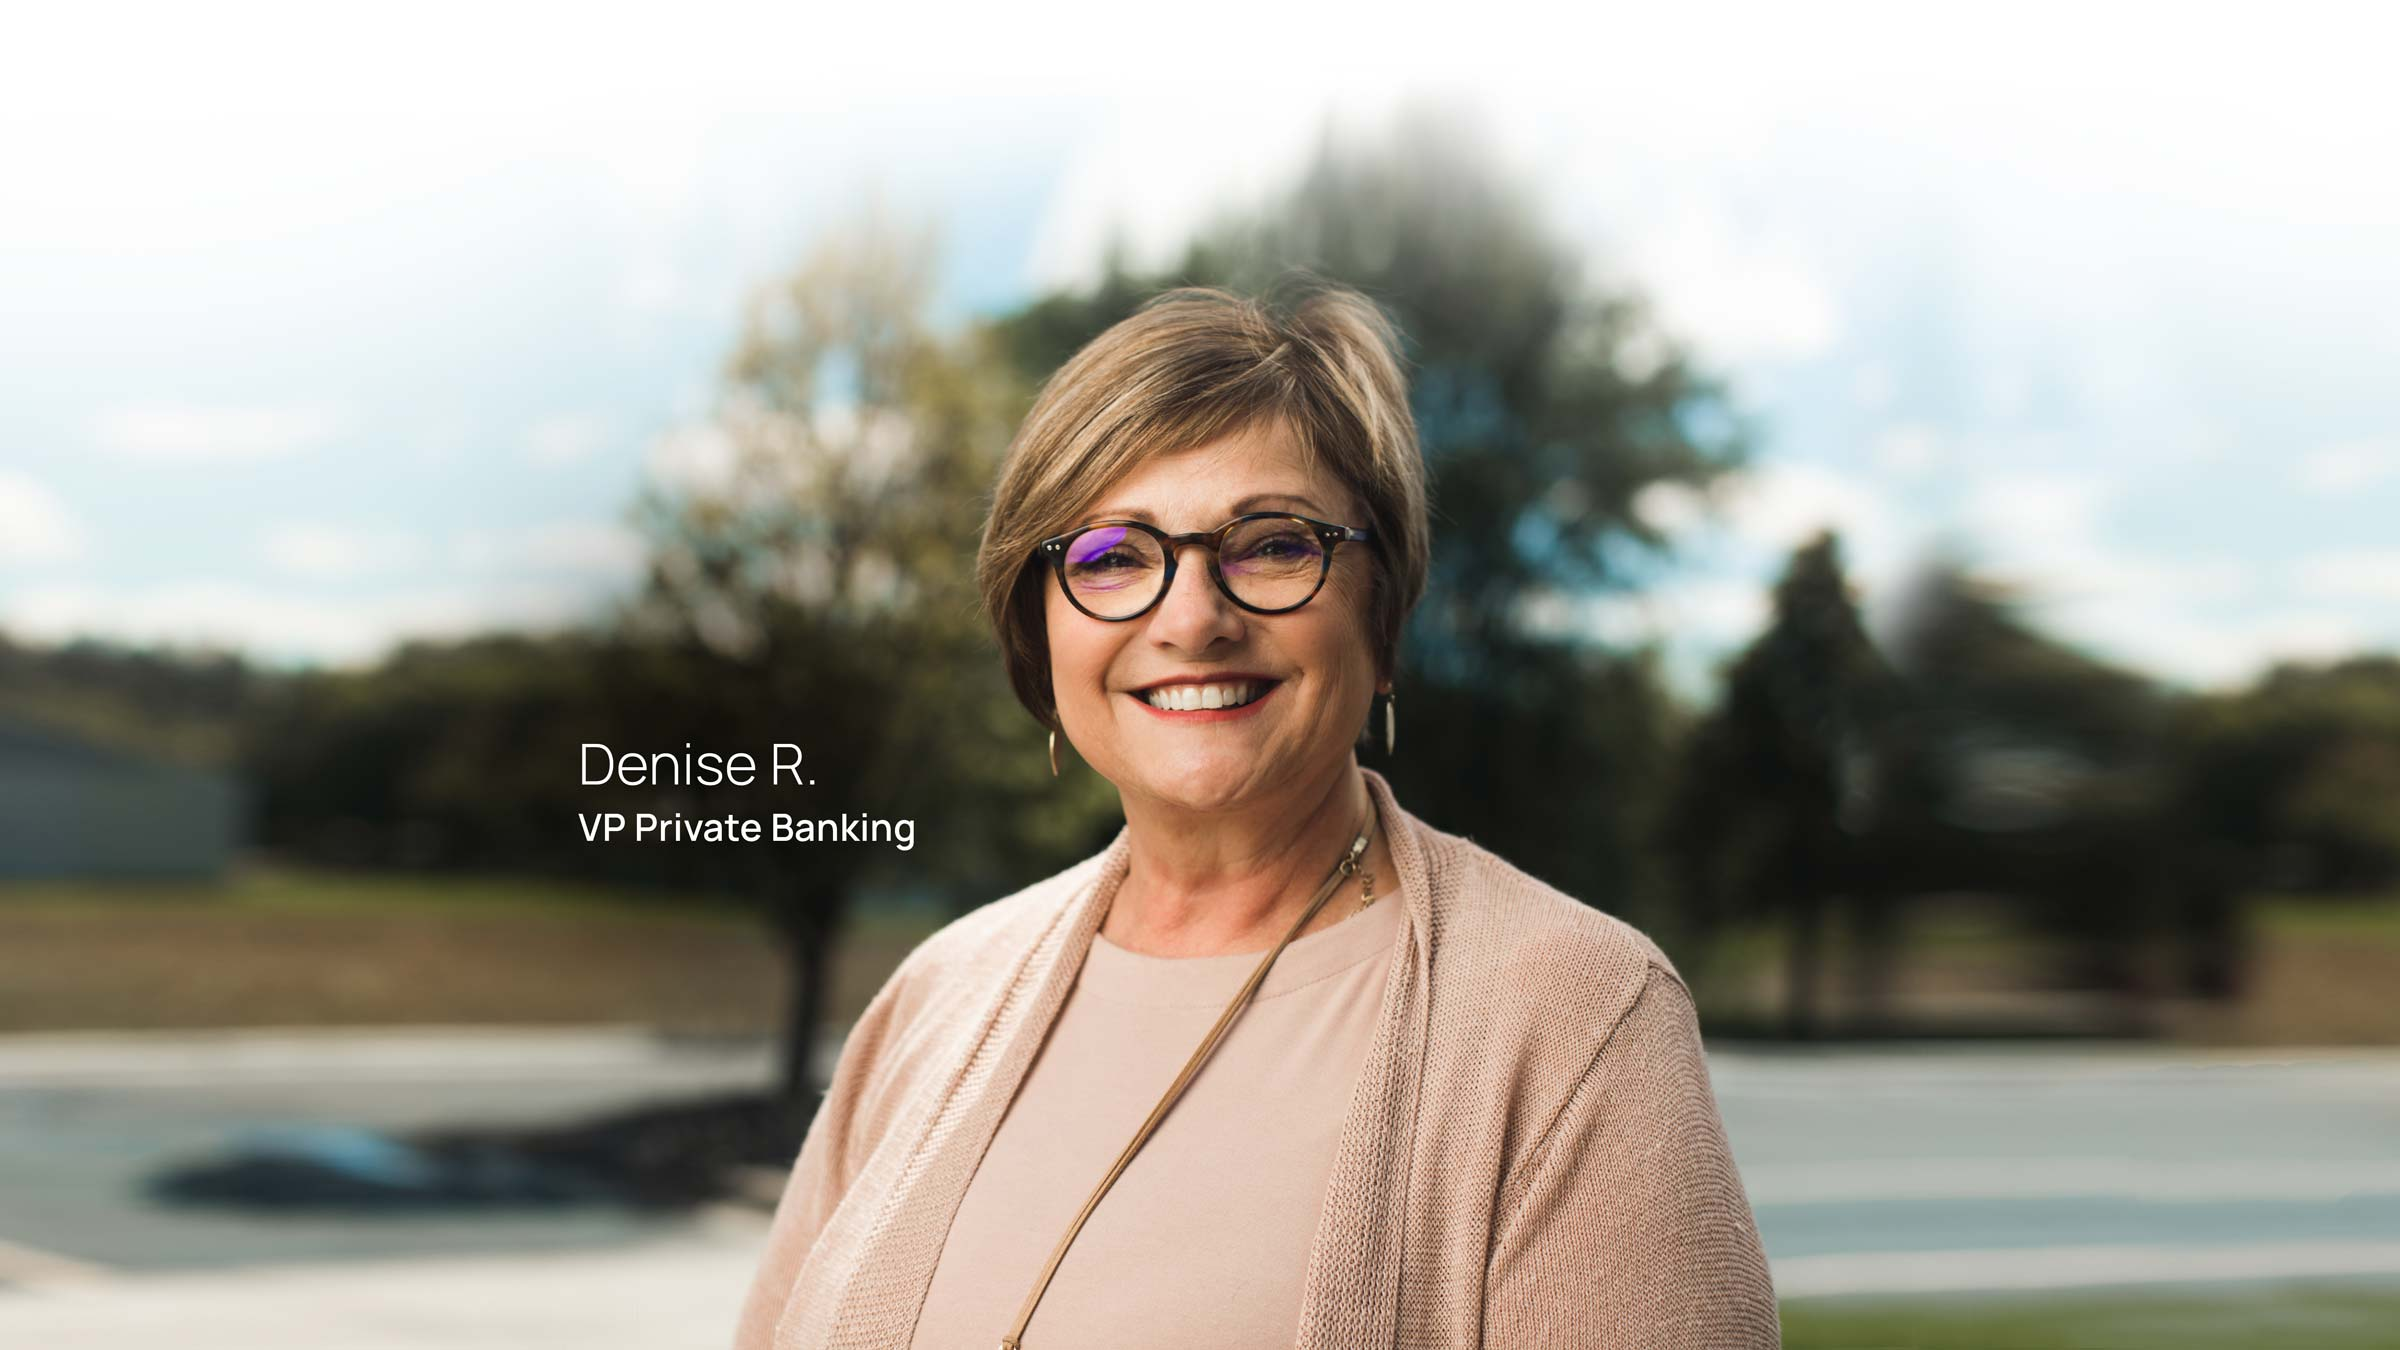 Denise R. VP Private Banking